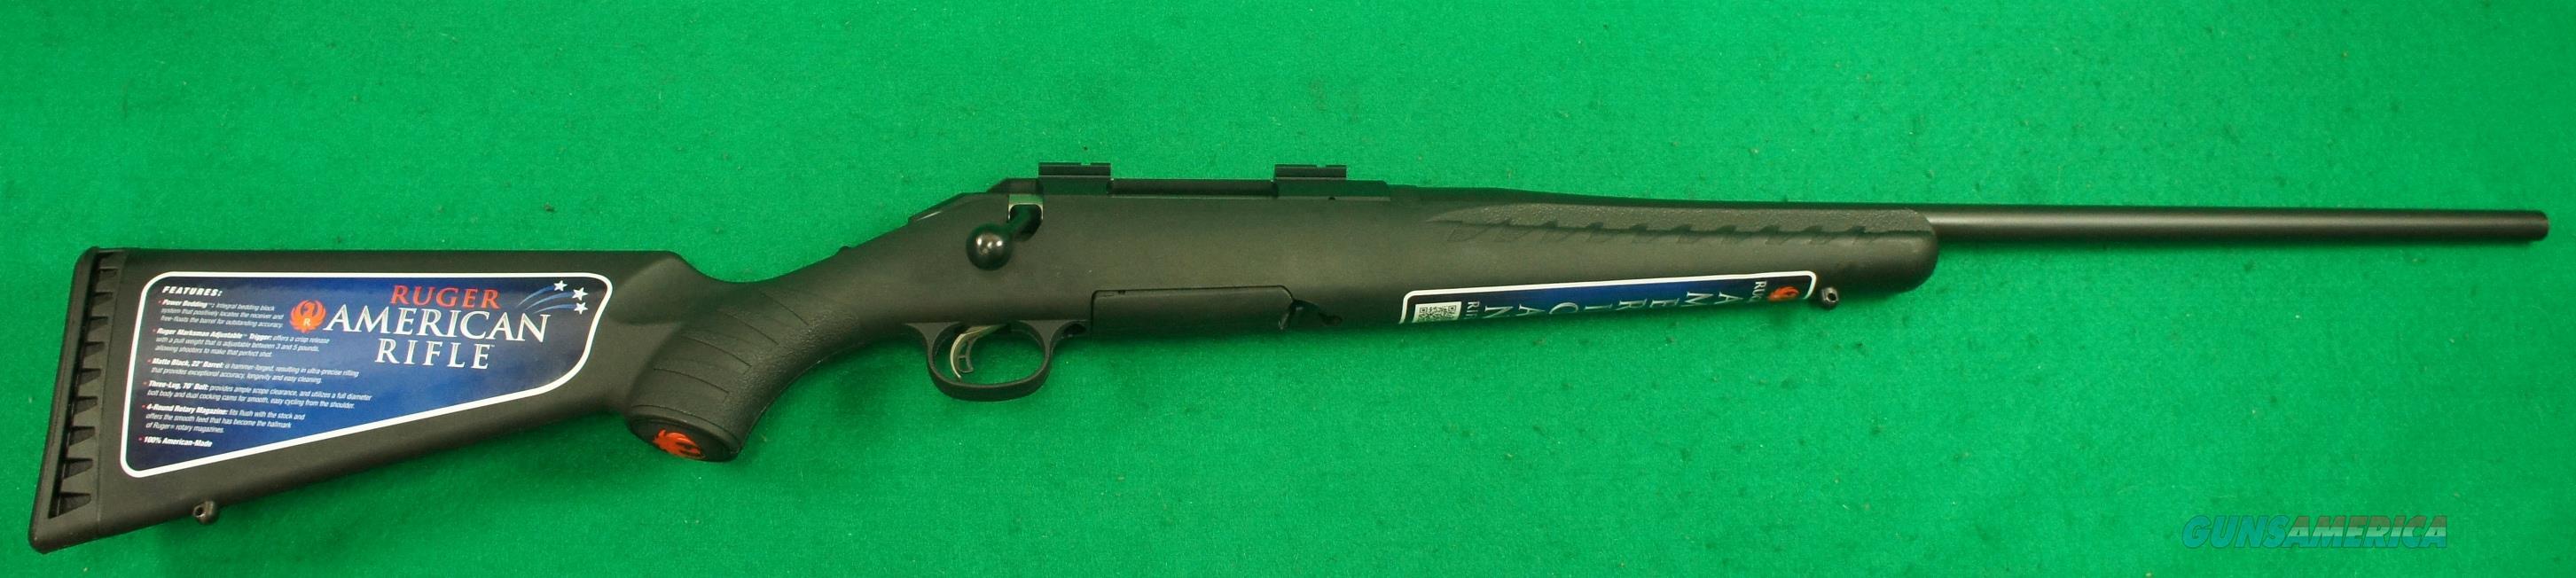 American Rifle Black Syn 30-06Spfld   22In  6901  Guns > Rifles > Ruger Rifles > American Rifle